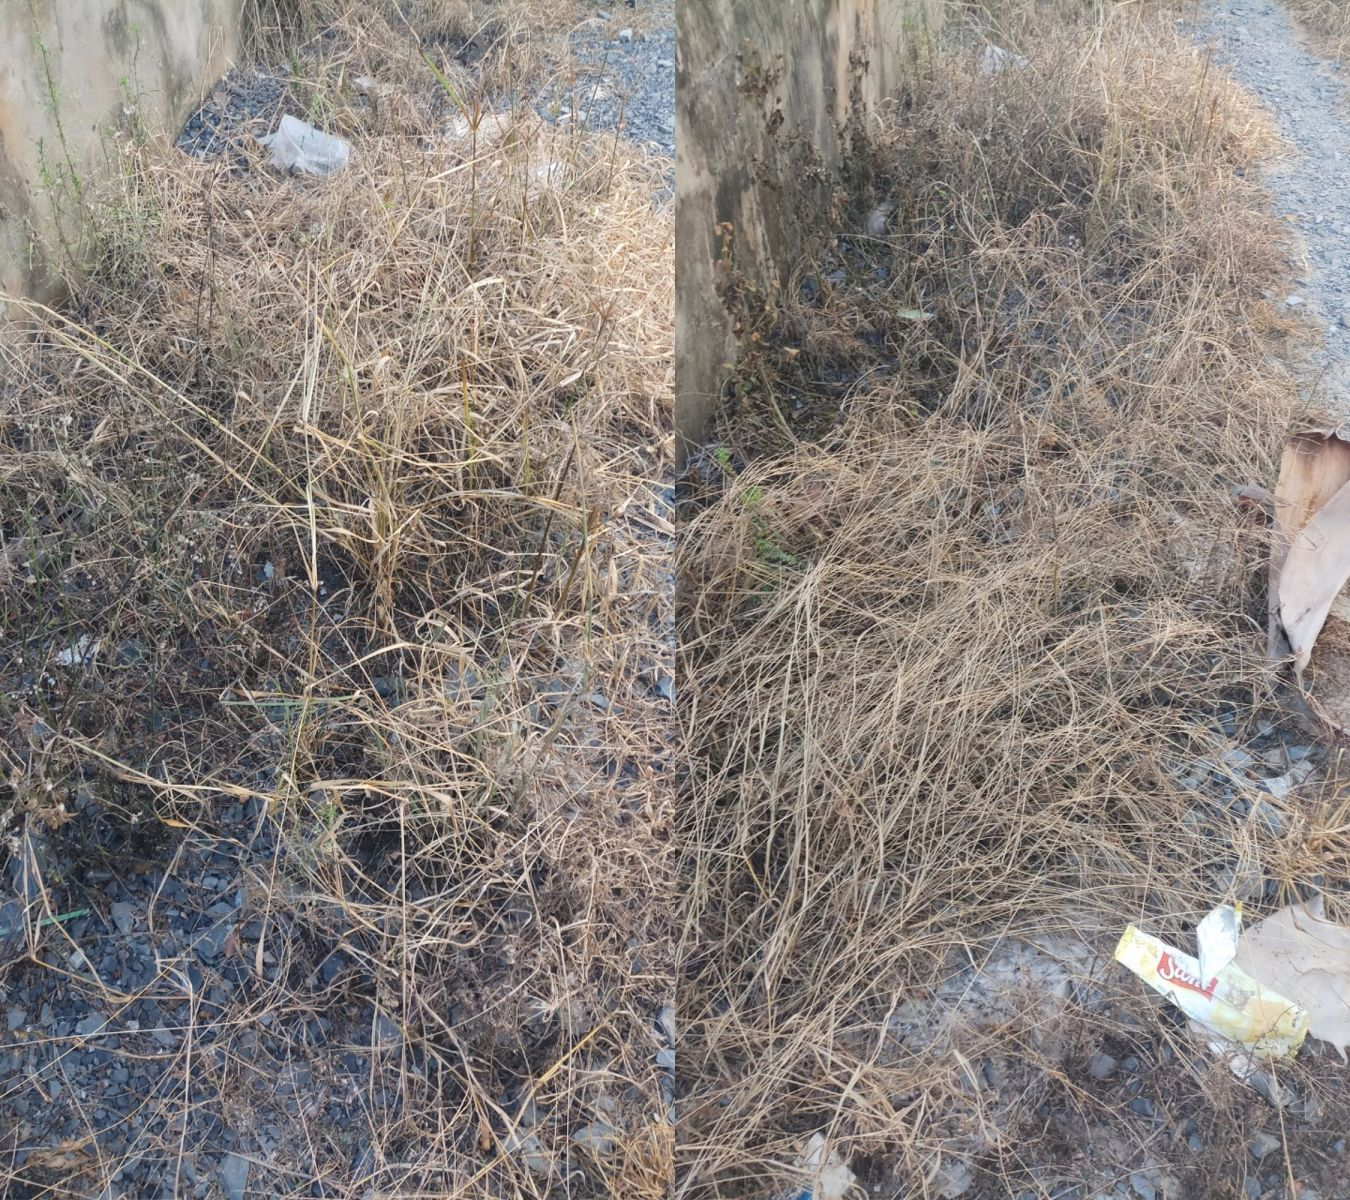 Sanuron 800WP diệt cỏ bờ ruộng